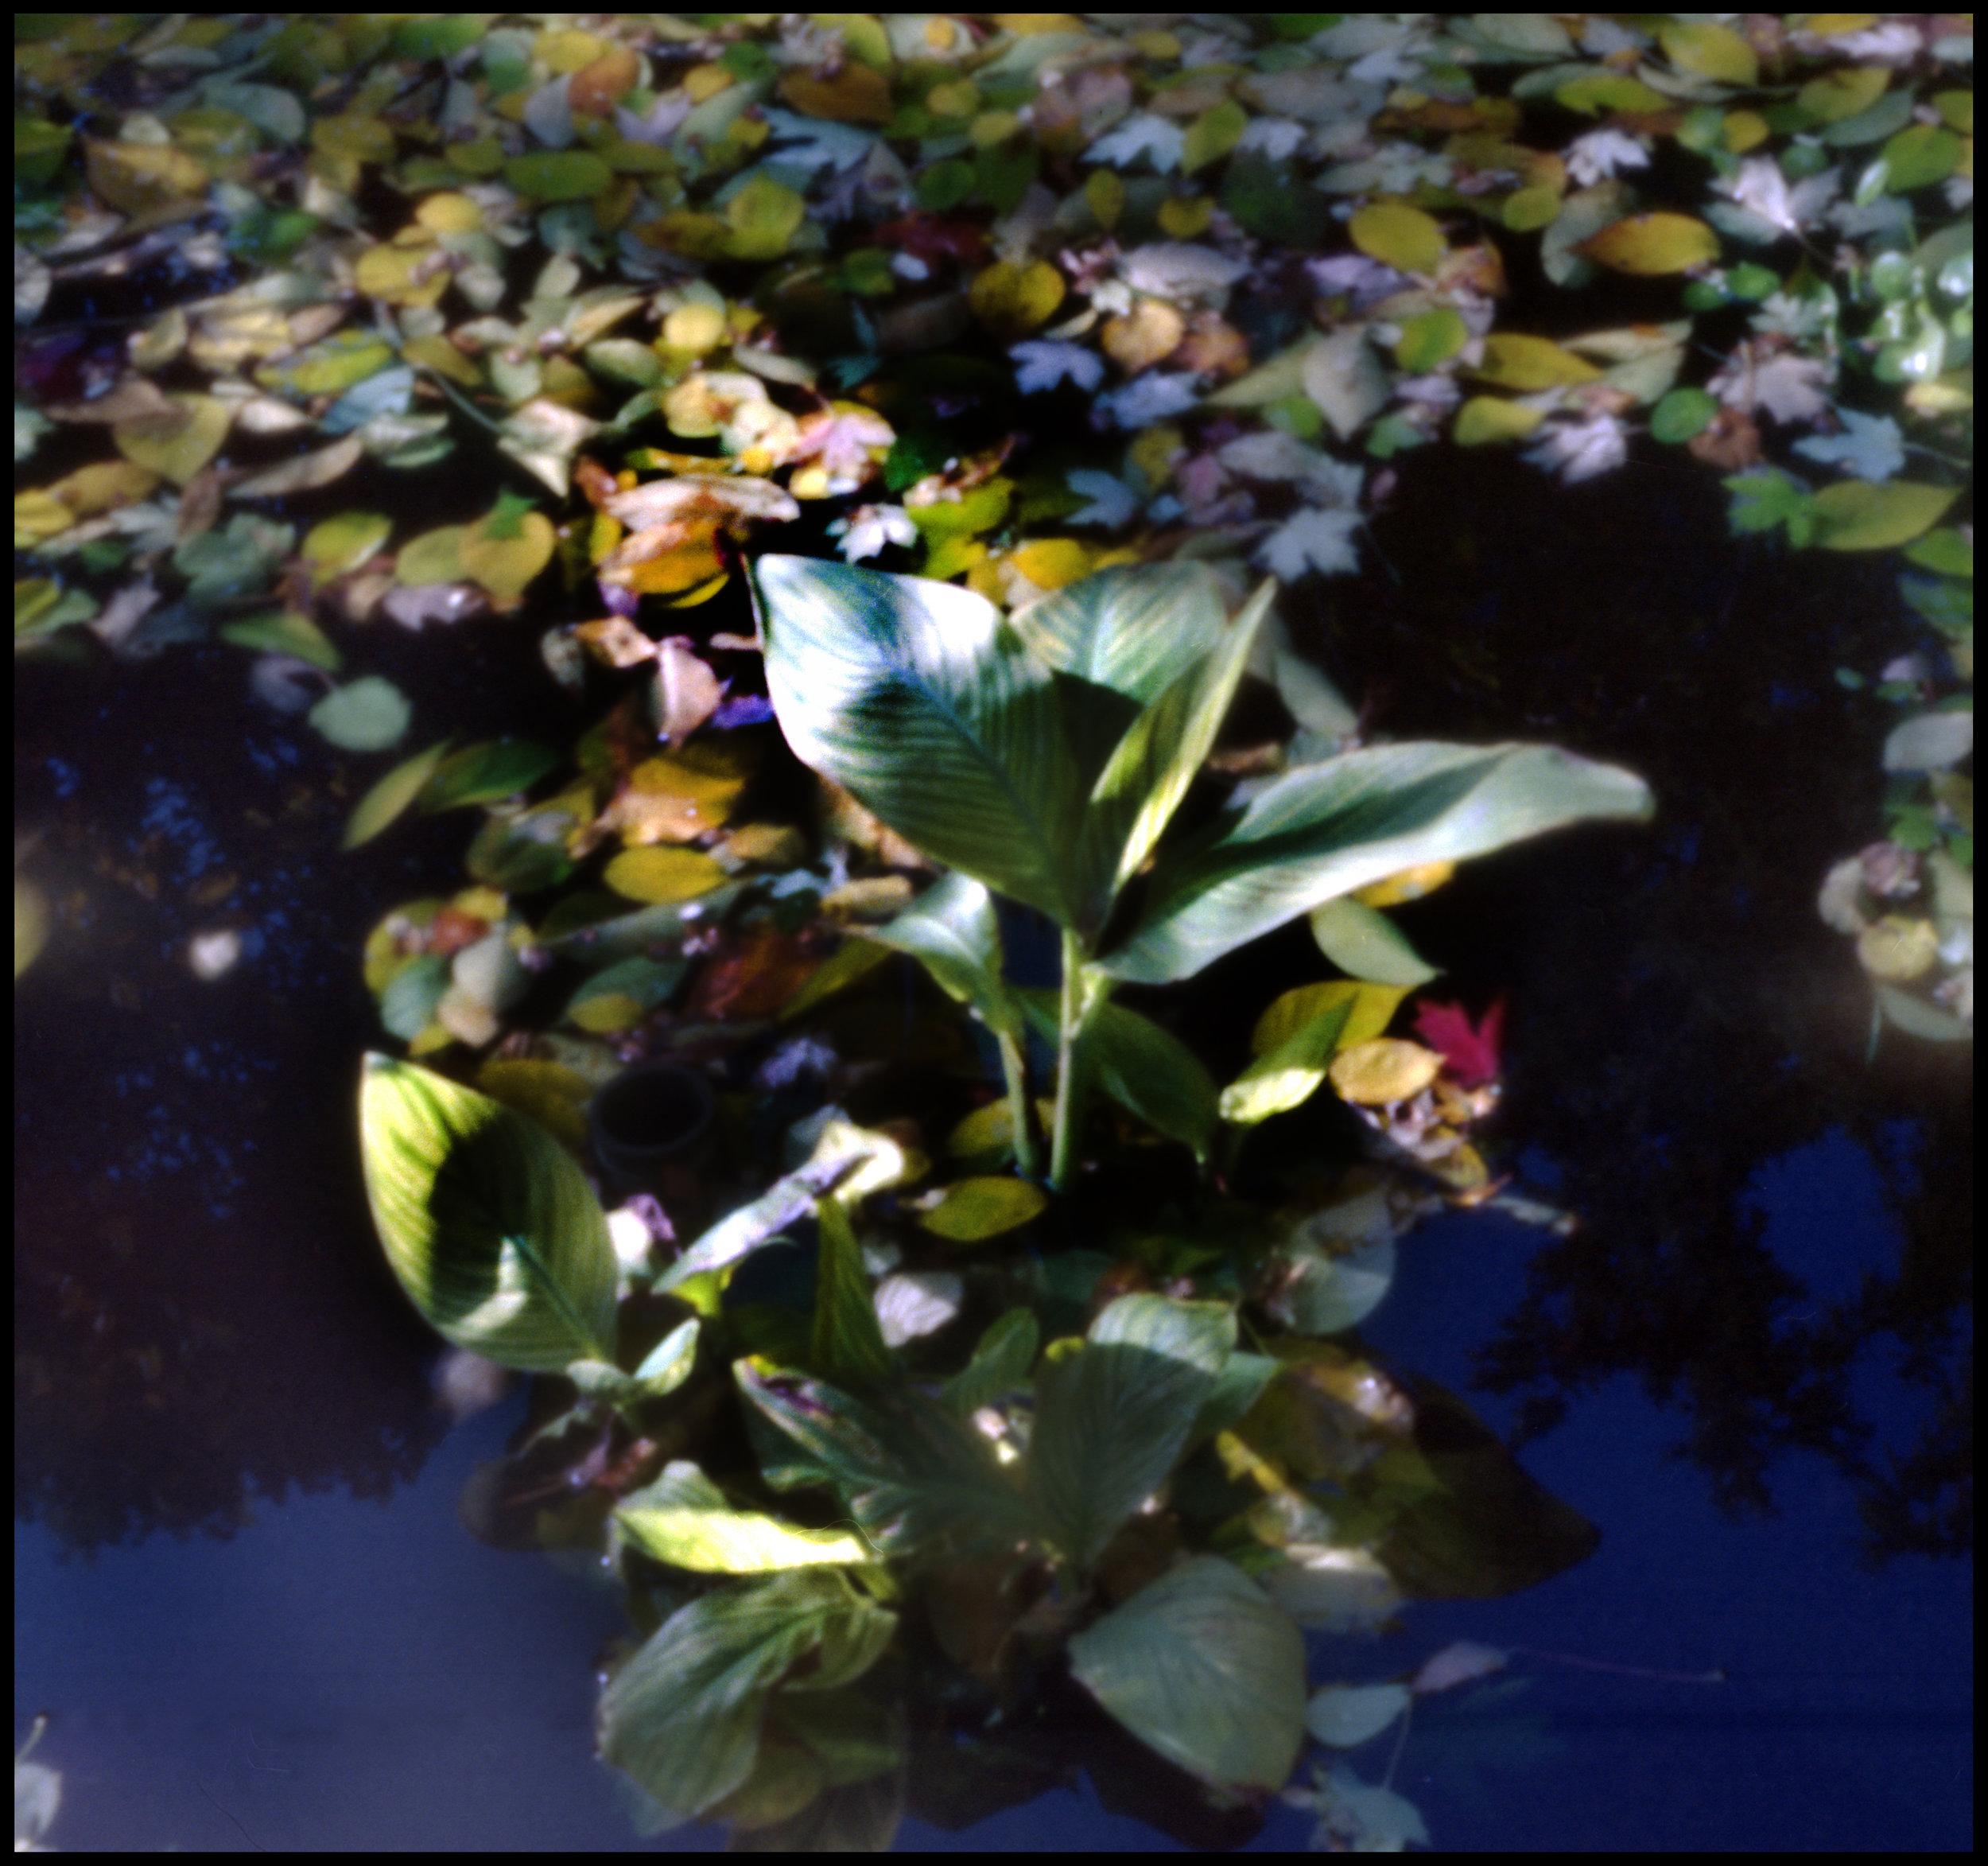 Photo made with the pinhole camera.